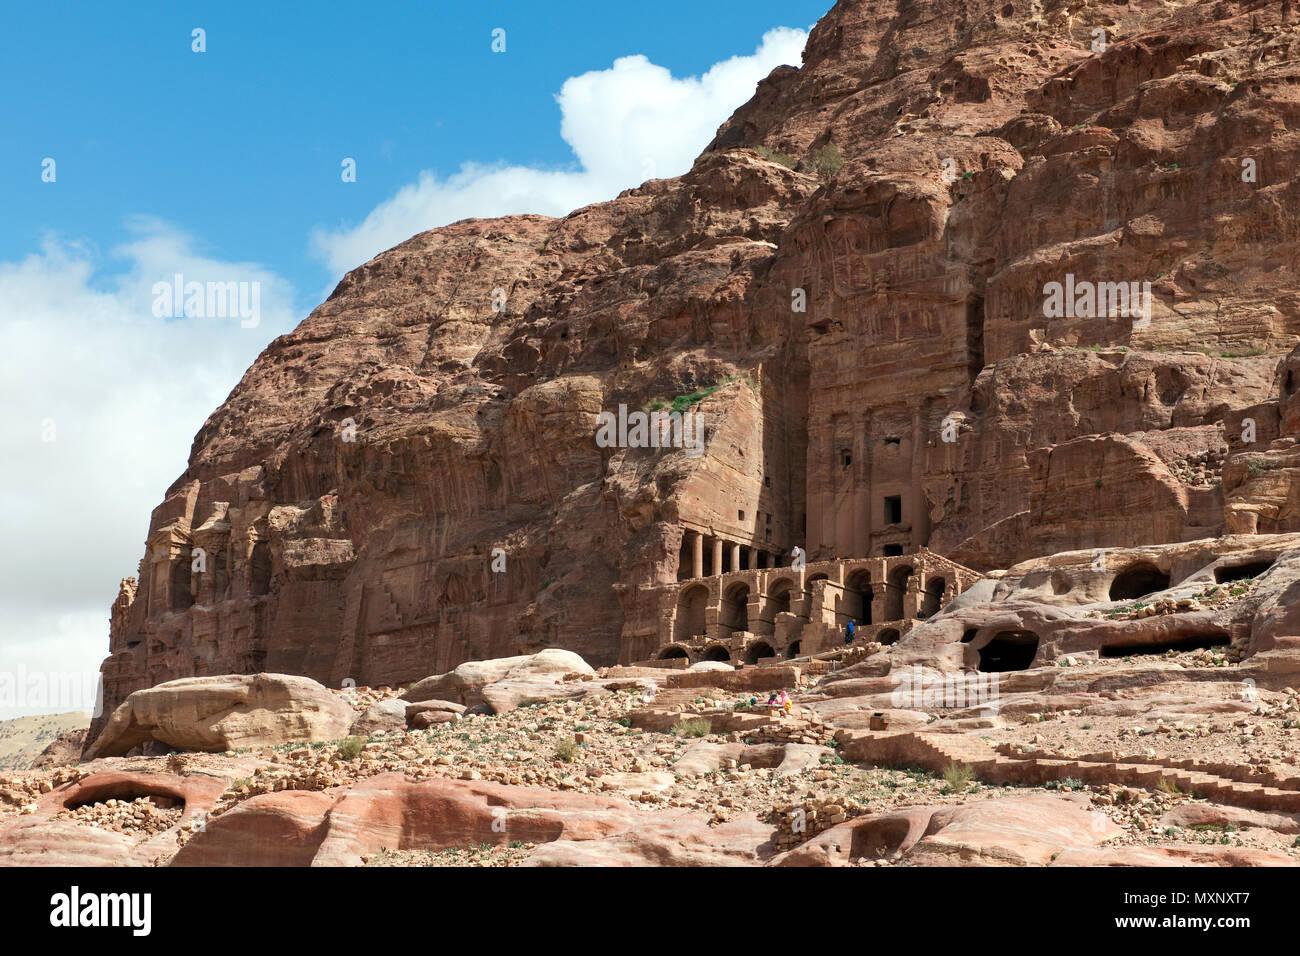 King's Wall, Petra Archaeological Park, Petra, Jordan, Asia Minor / Petra | Koenigswand, Archaeologischer Park Petra, Felsenstadt Petra, Jordanien, Stock Photo